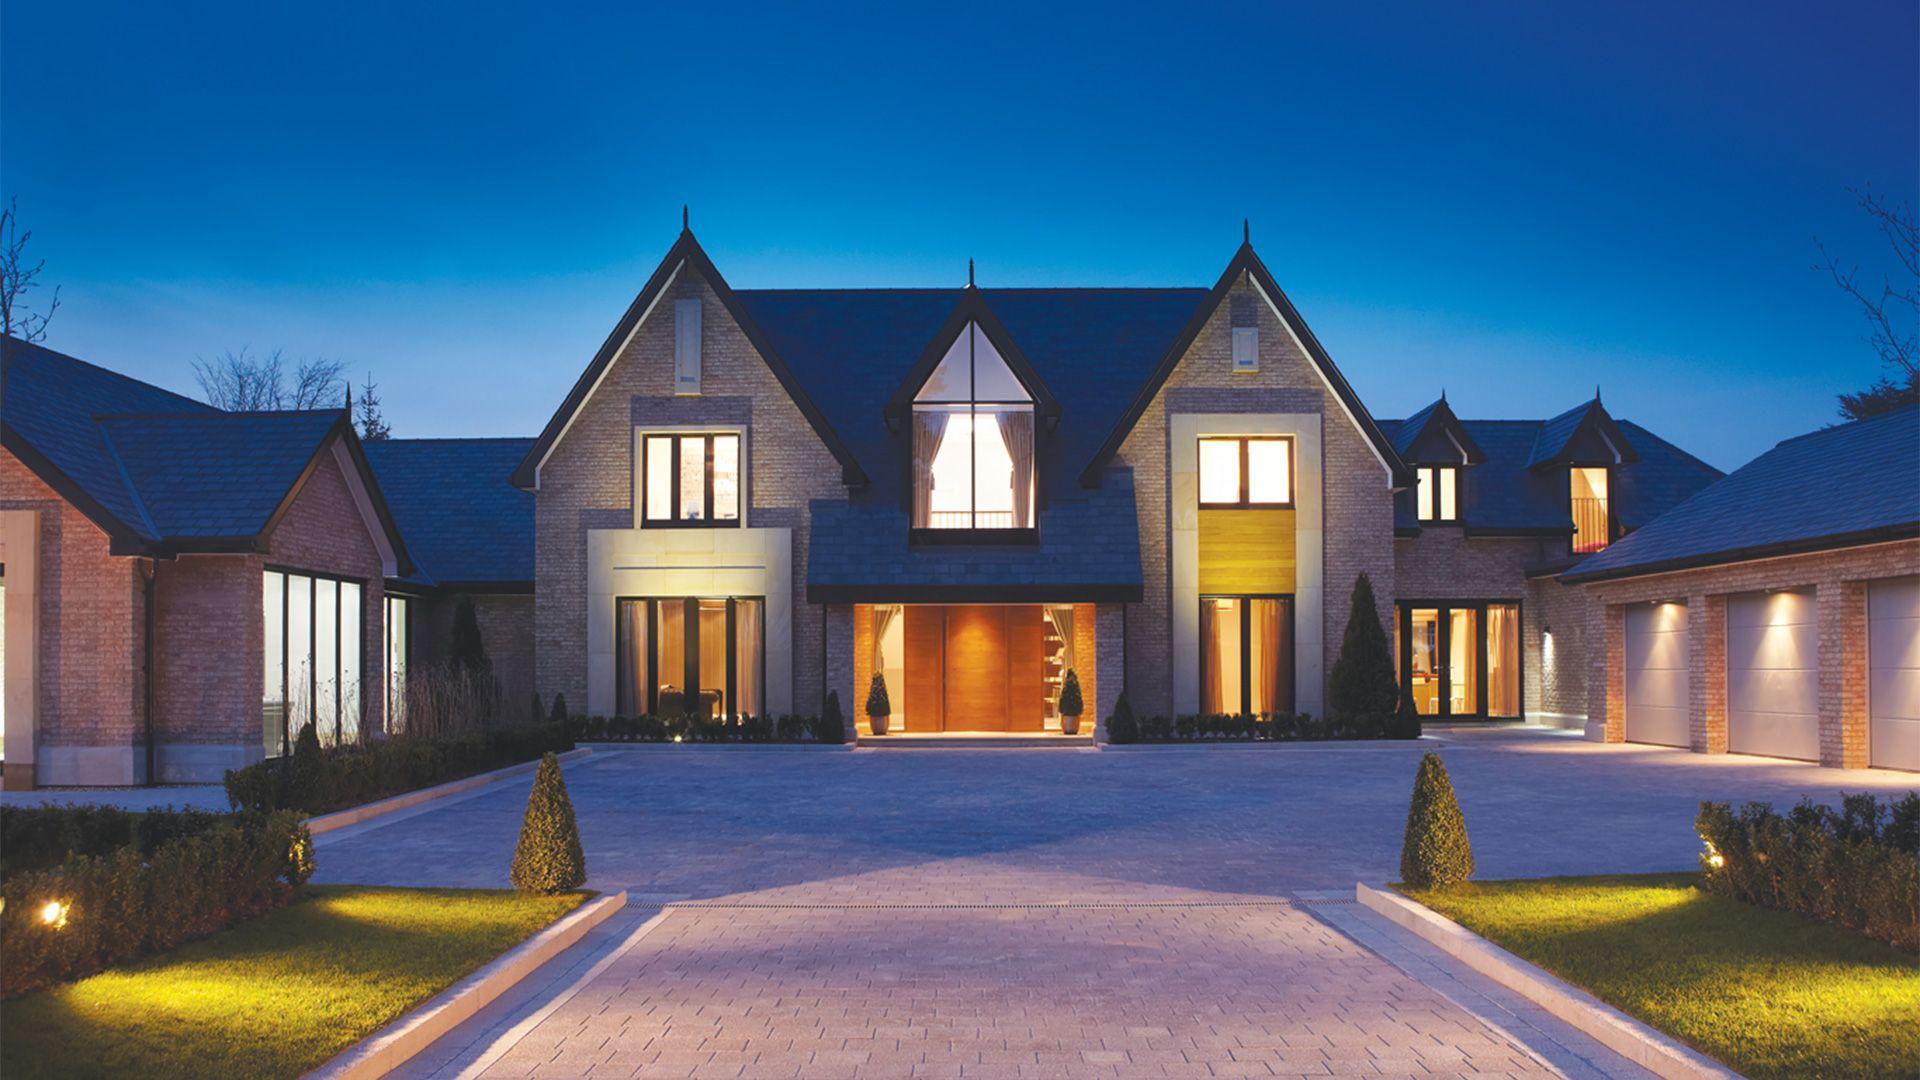 Seven torkington road wilmslow exterior modern house plans modern house design dream